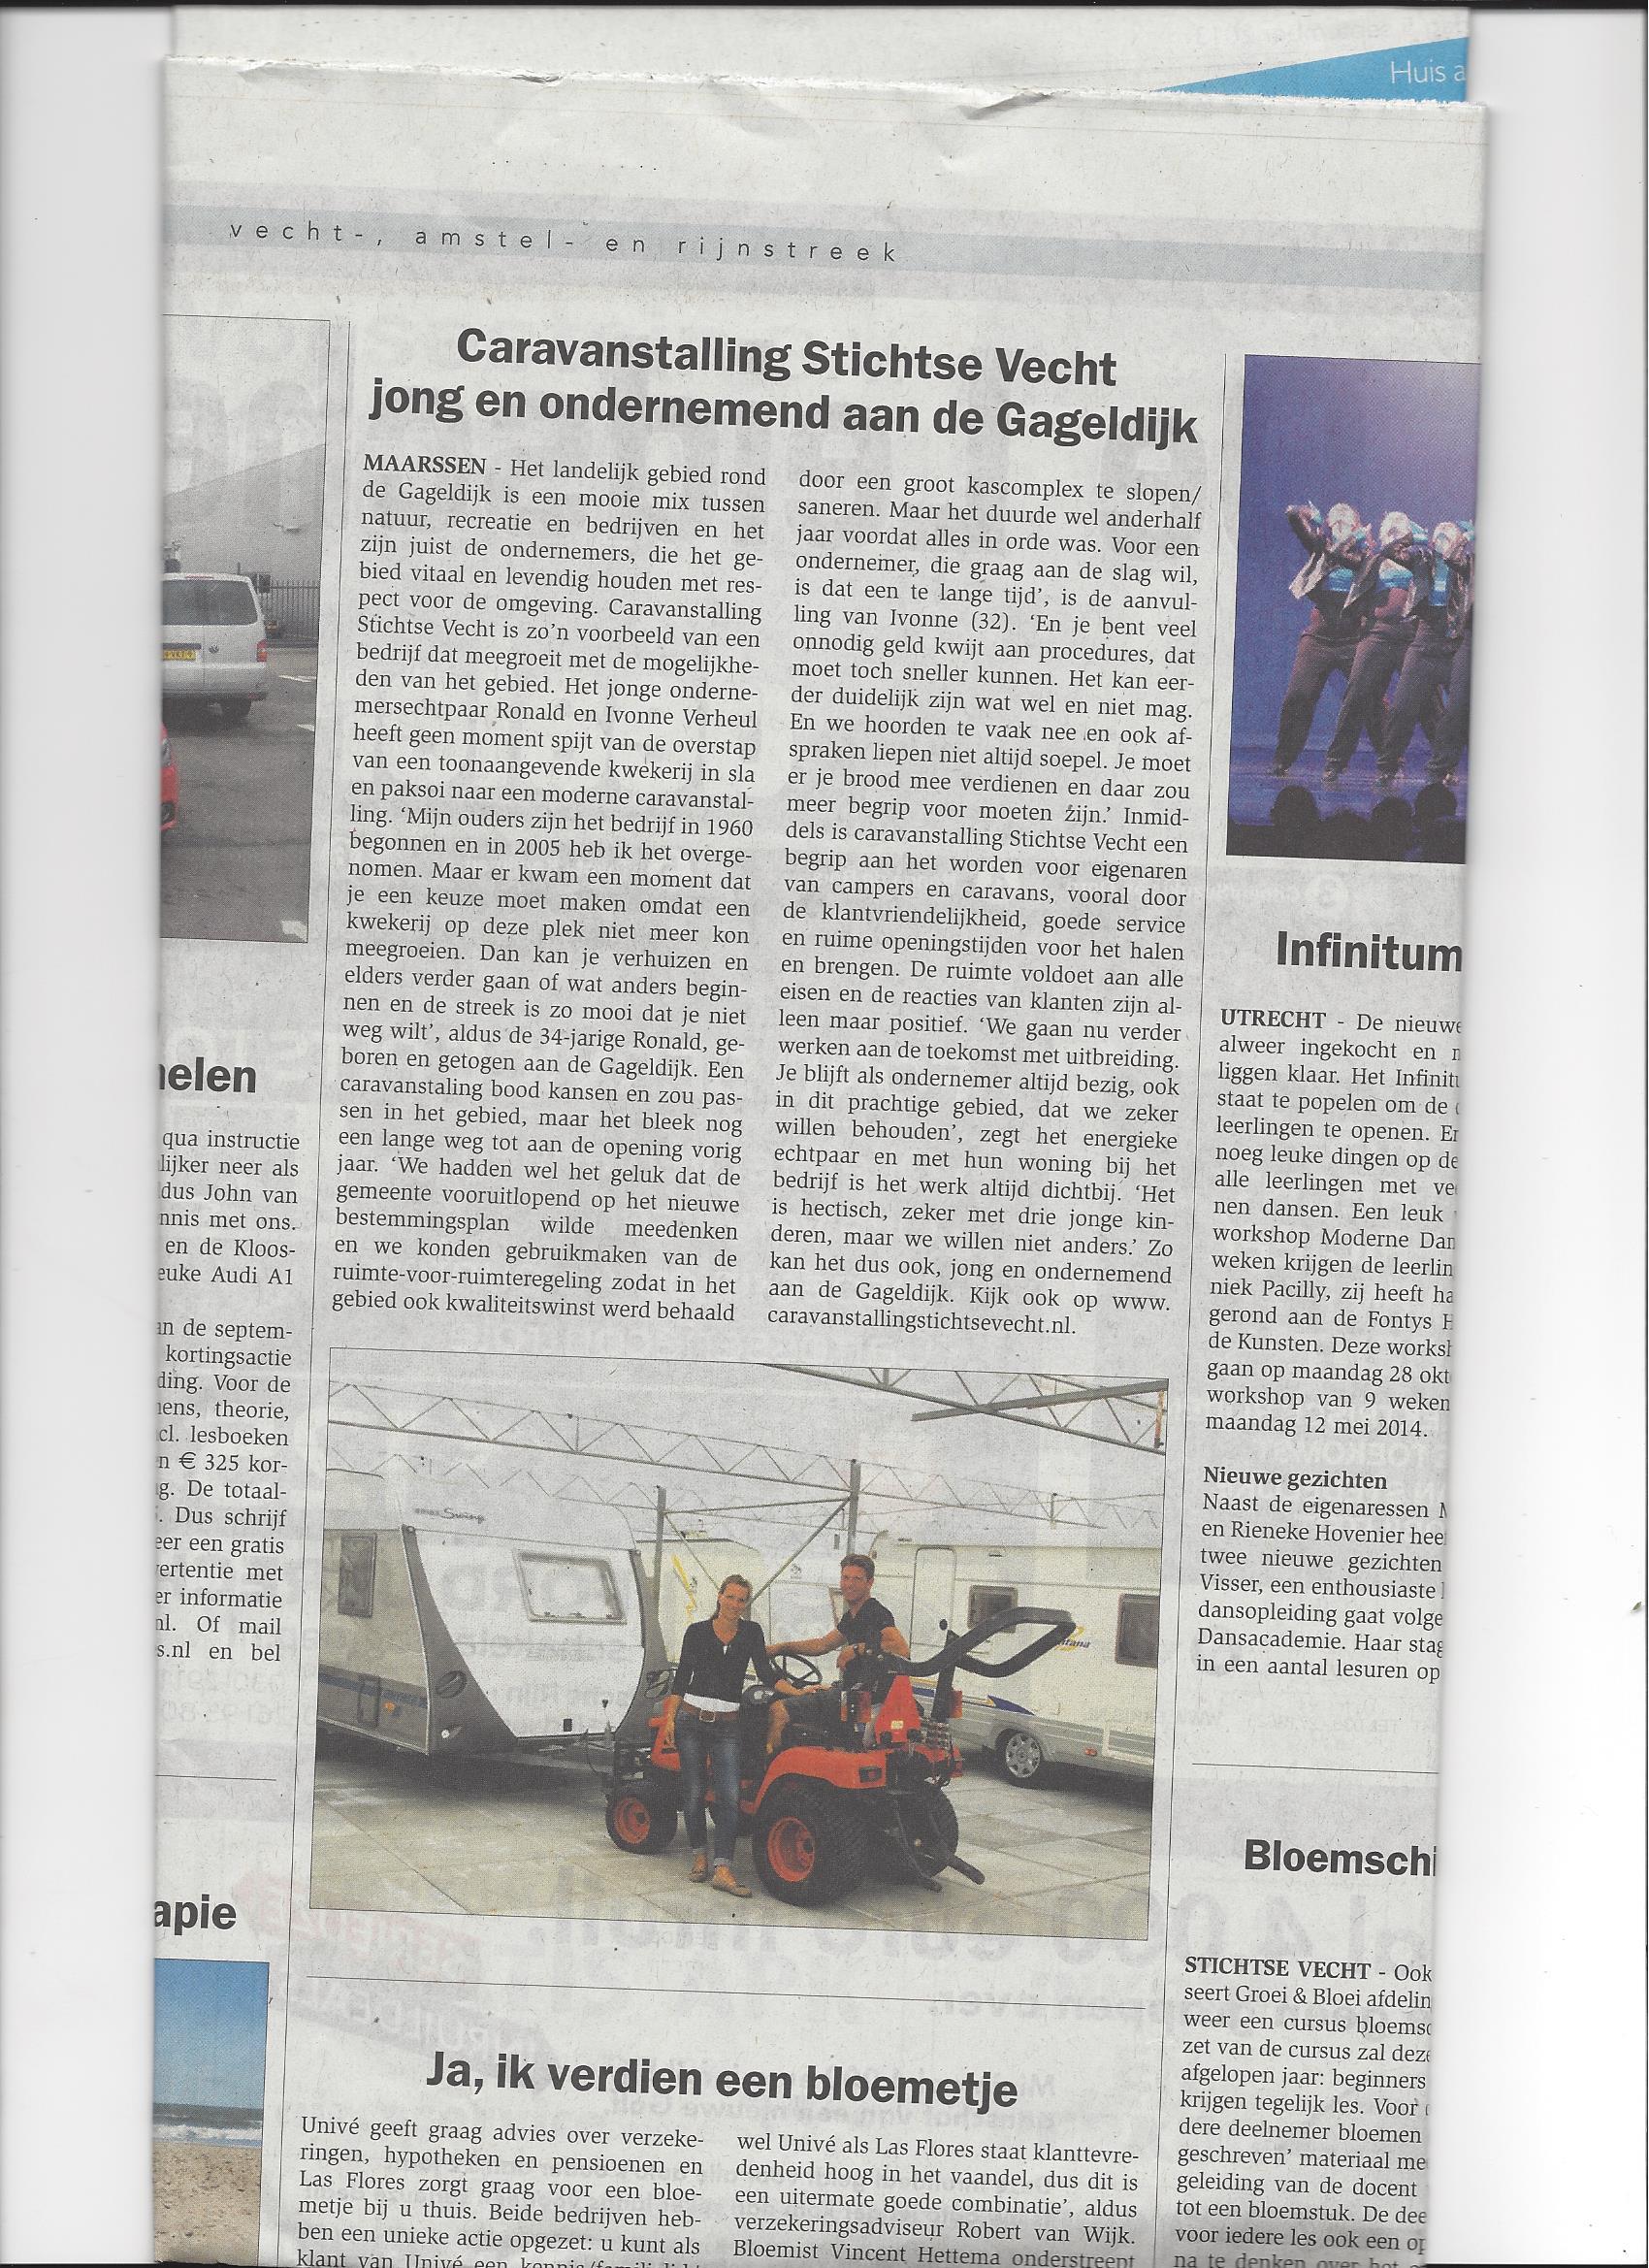 Krantenartikel over Caravanstalling Stichtse Vecht